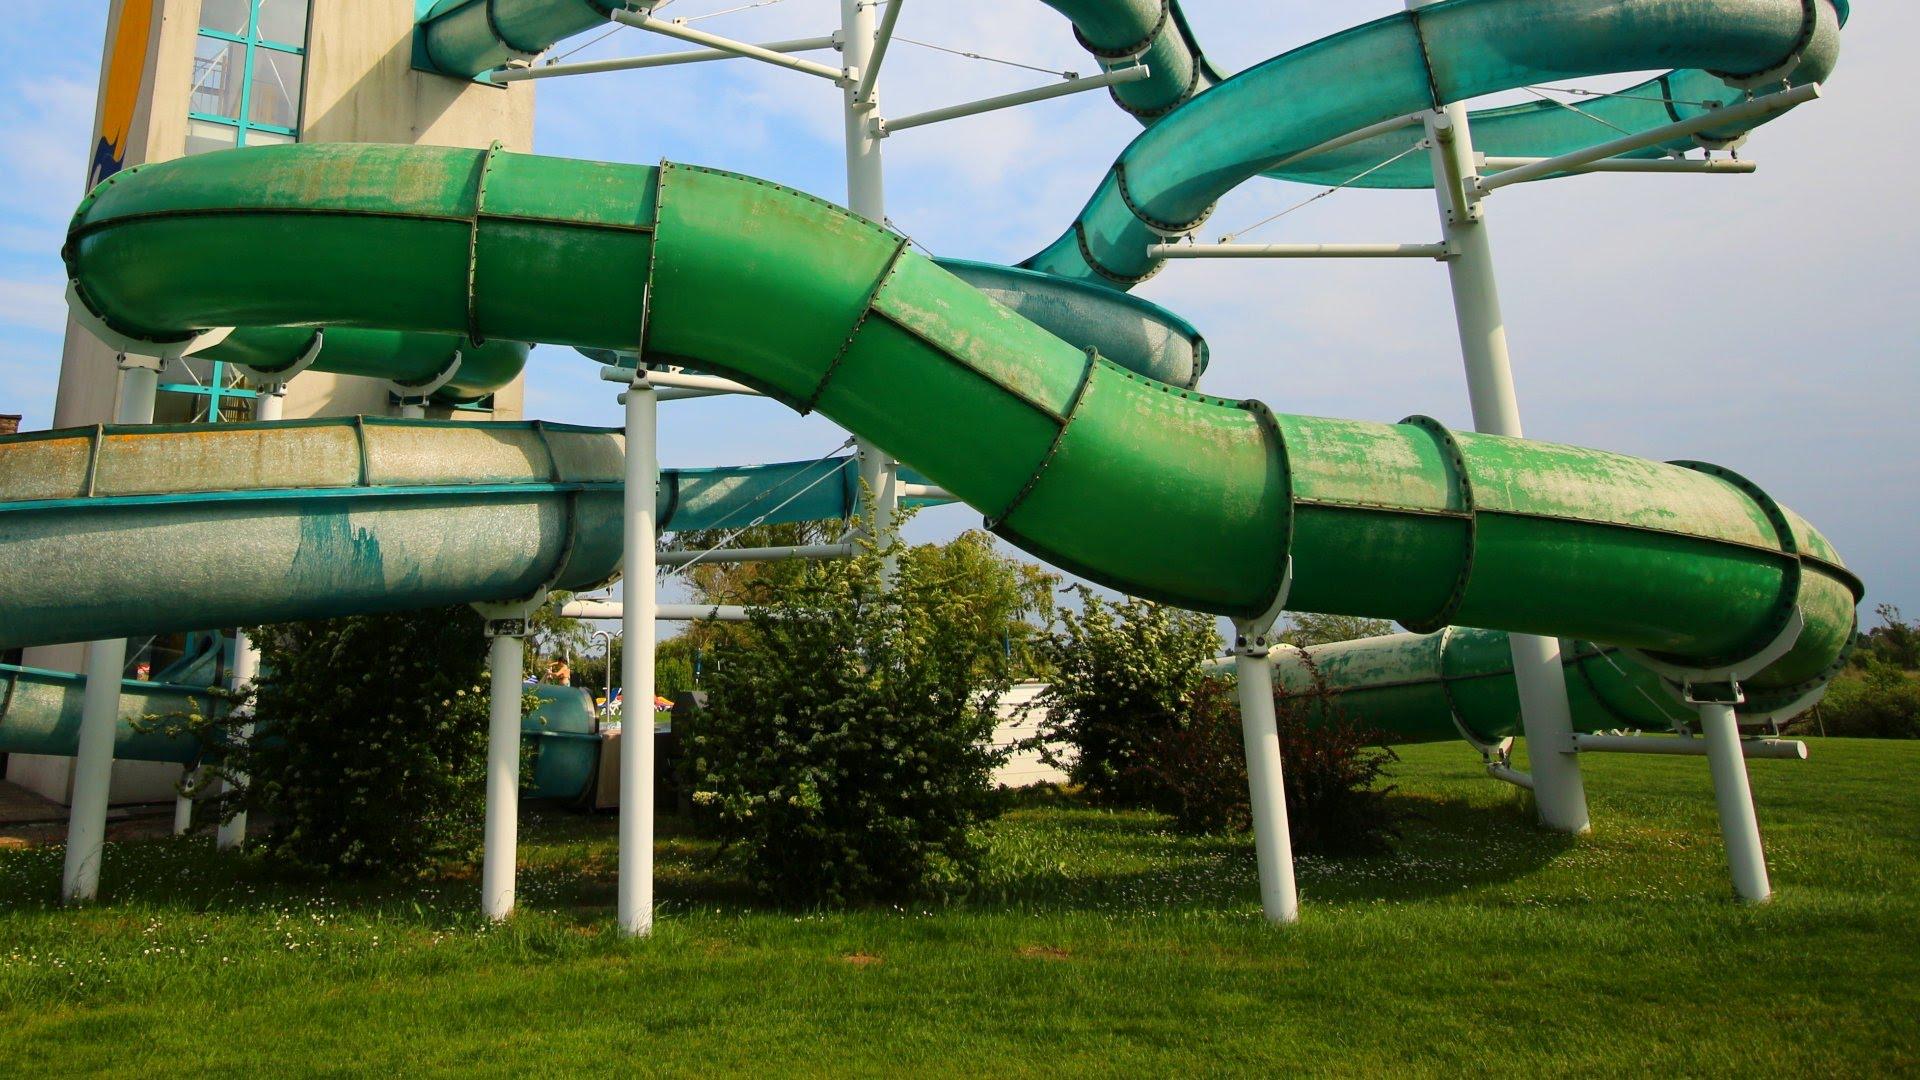 Hallenbad Neusiedl am See   grüne Röhrenrutsche Onride